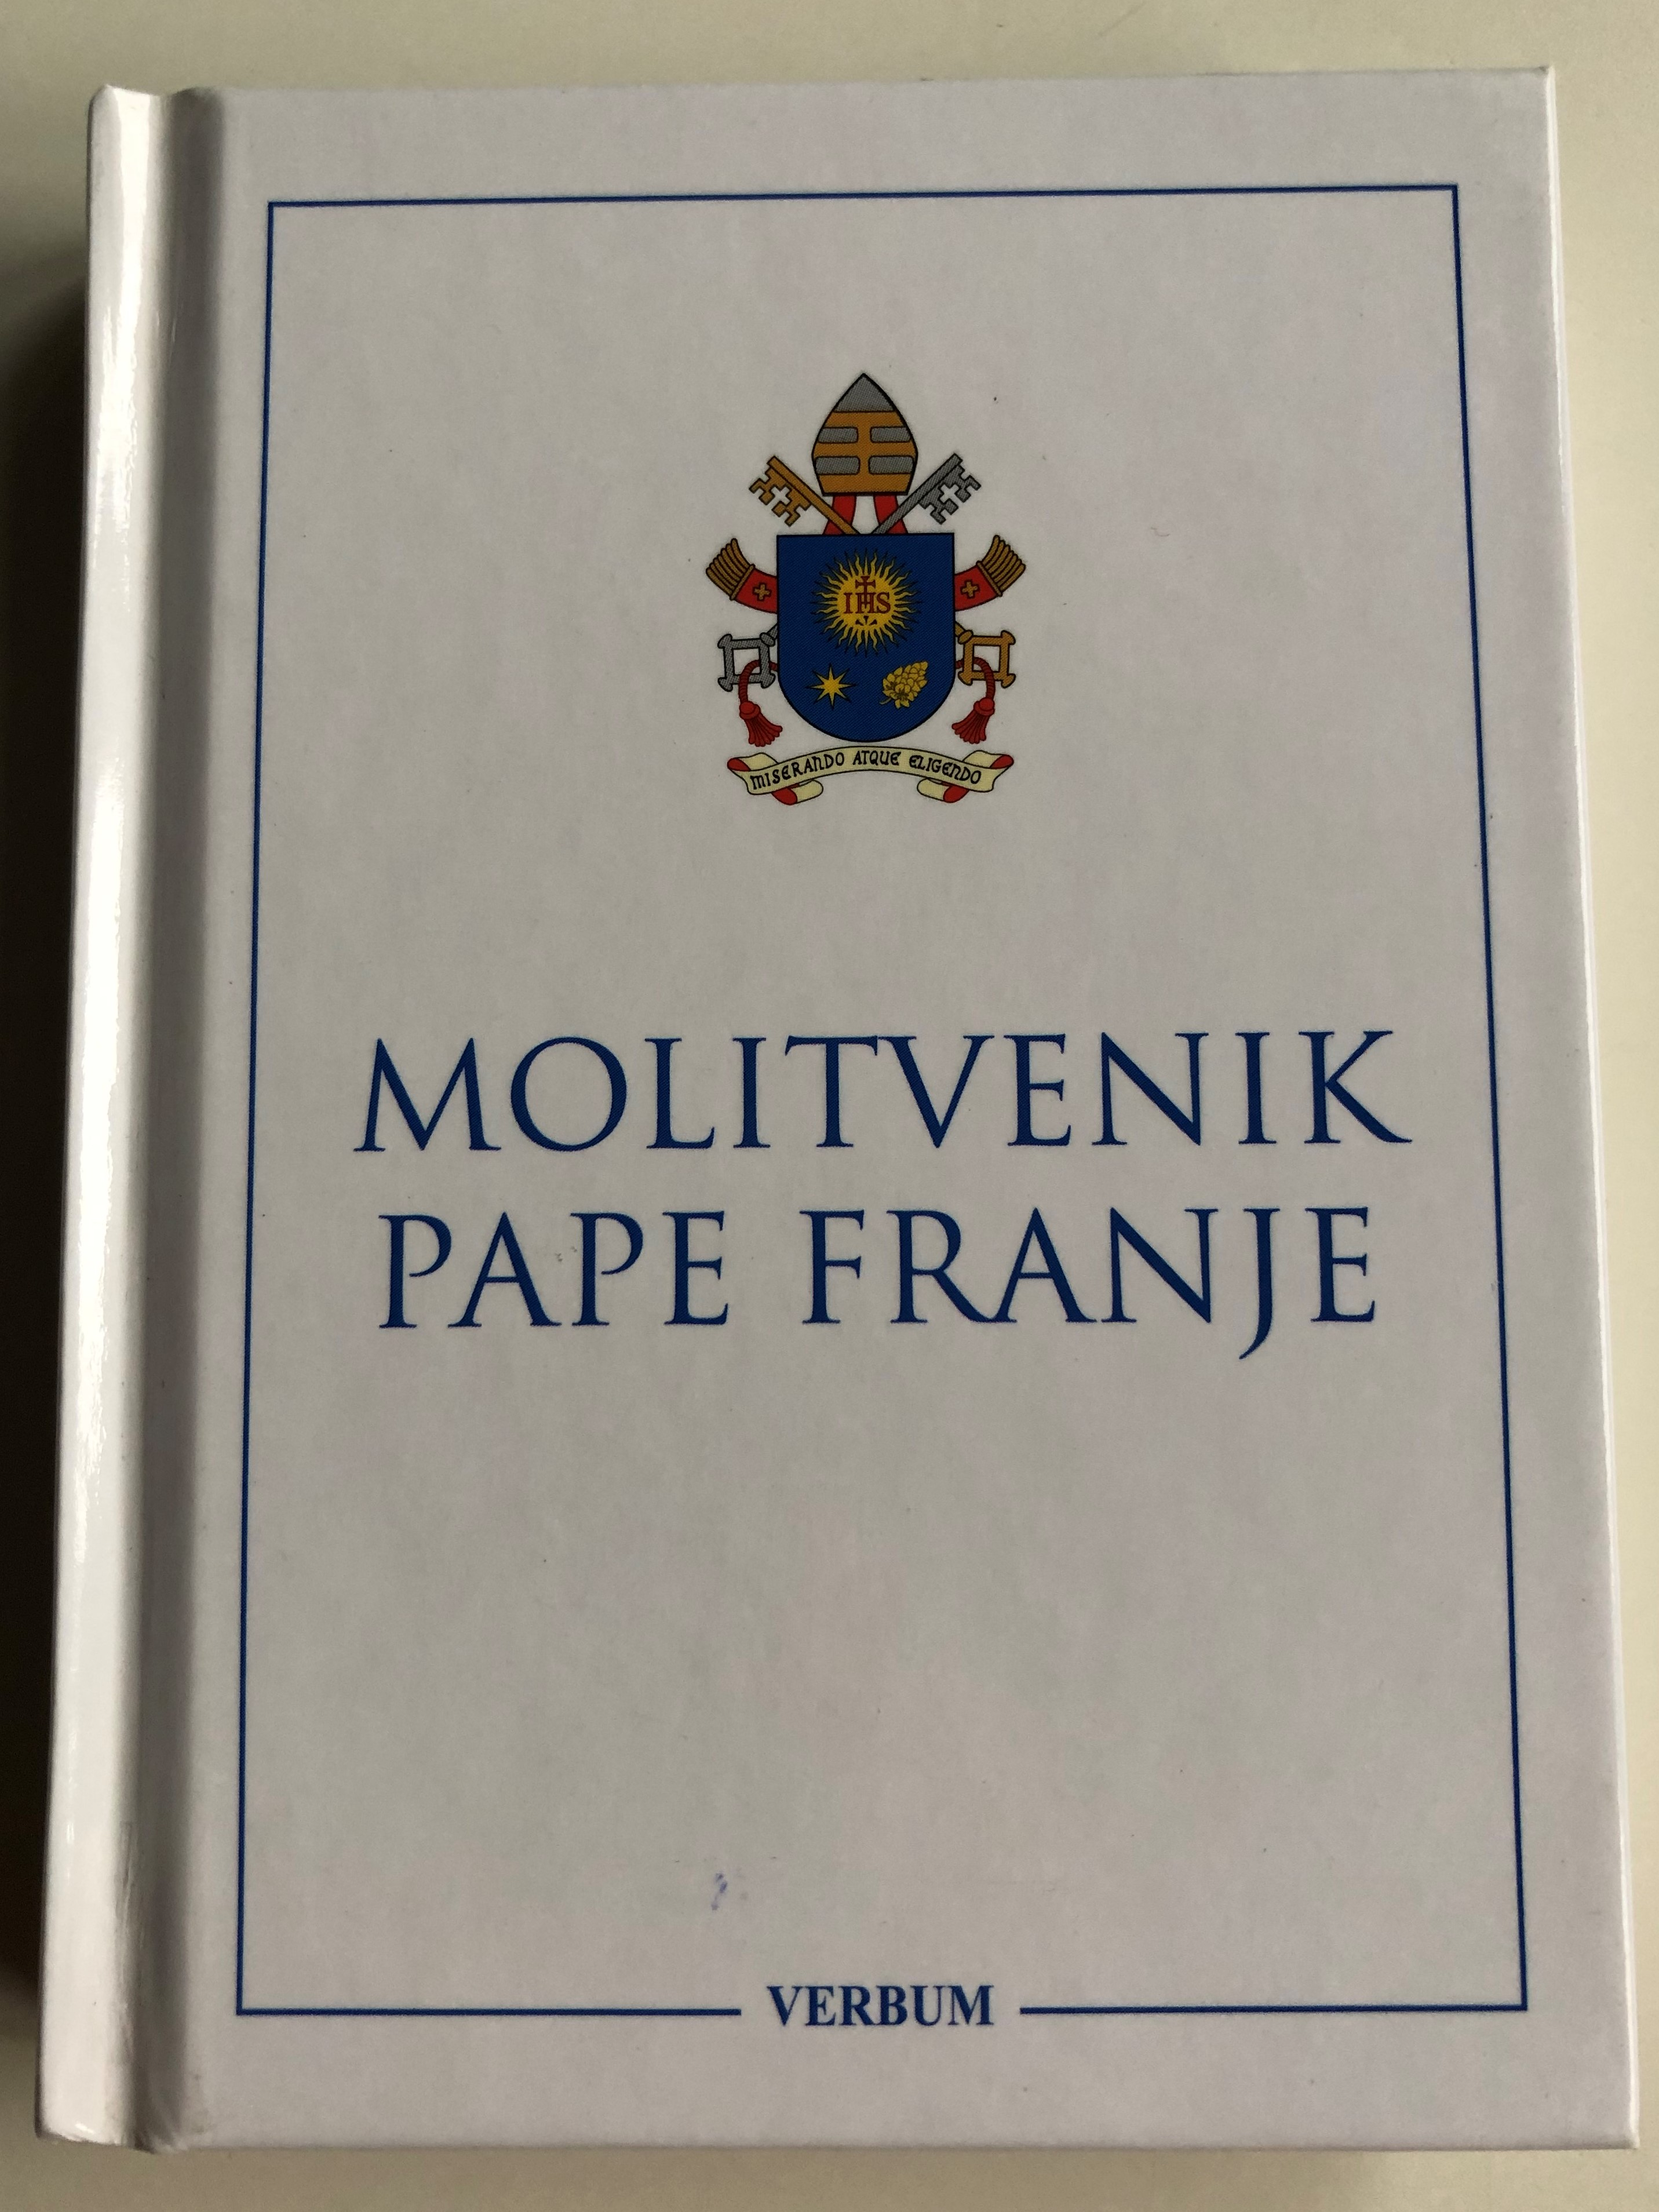 croatian-language-prayer-of-pope-francis-croatian-catholic-prayer-book-small-size-1.jpg